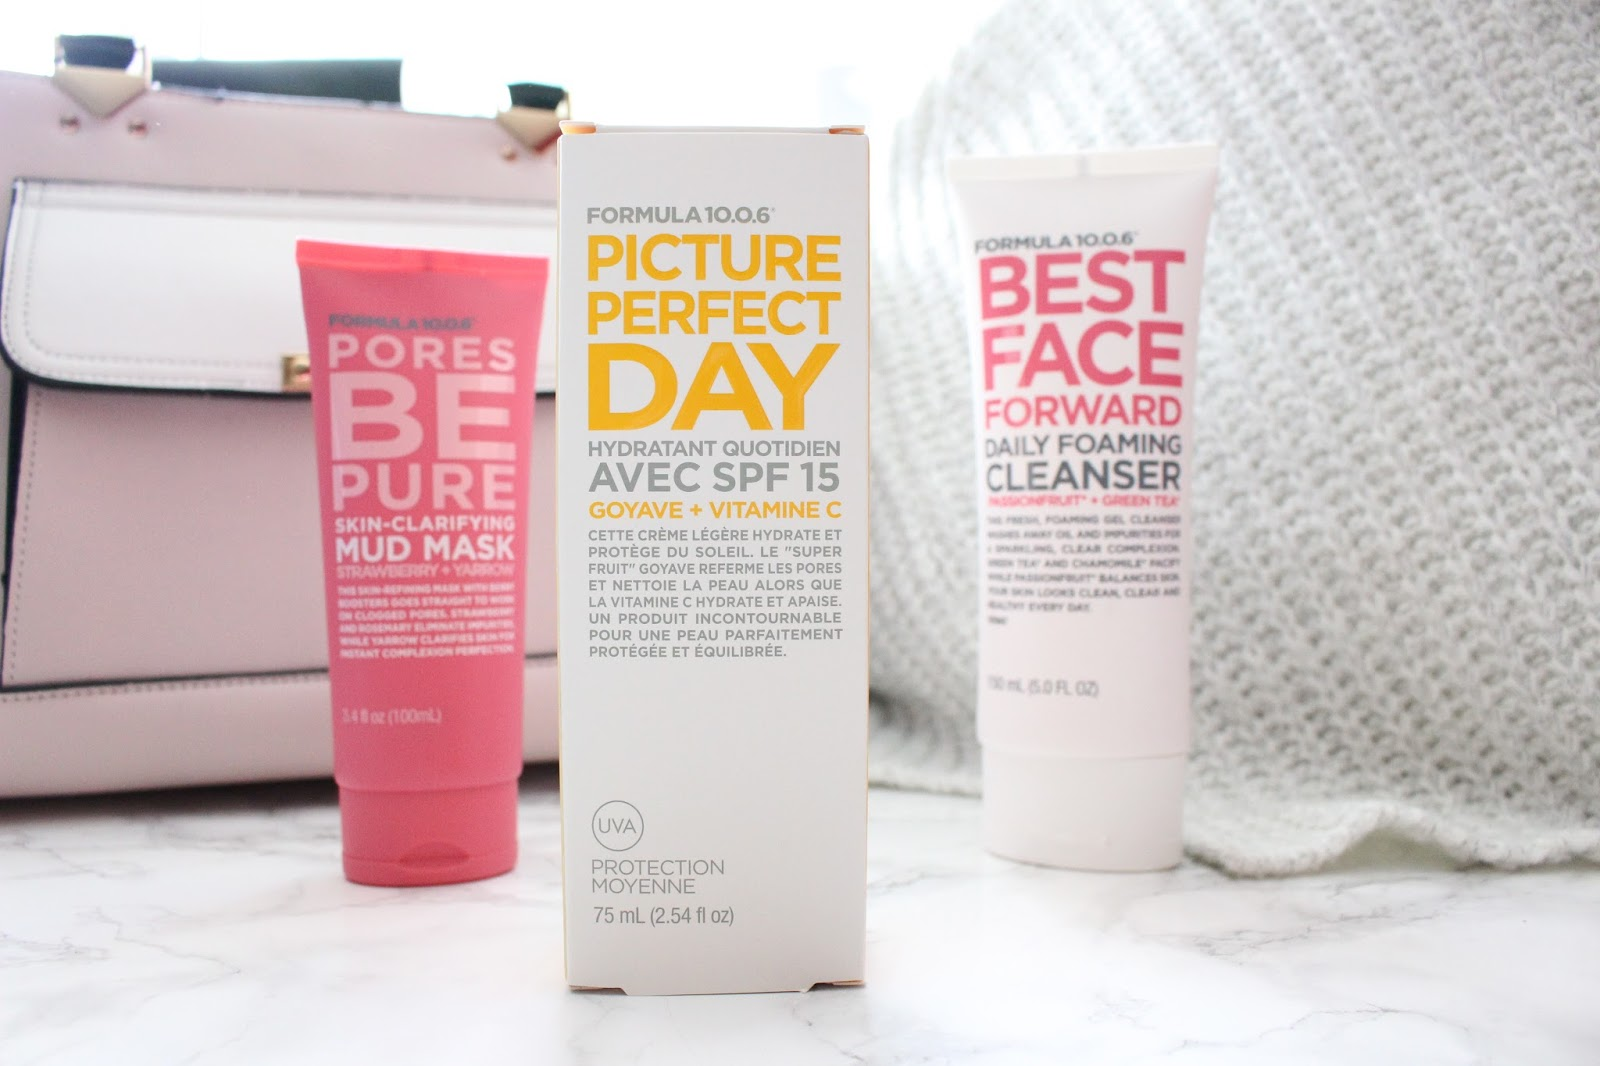 Formula 10.0.6 Skincare